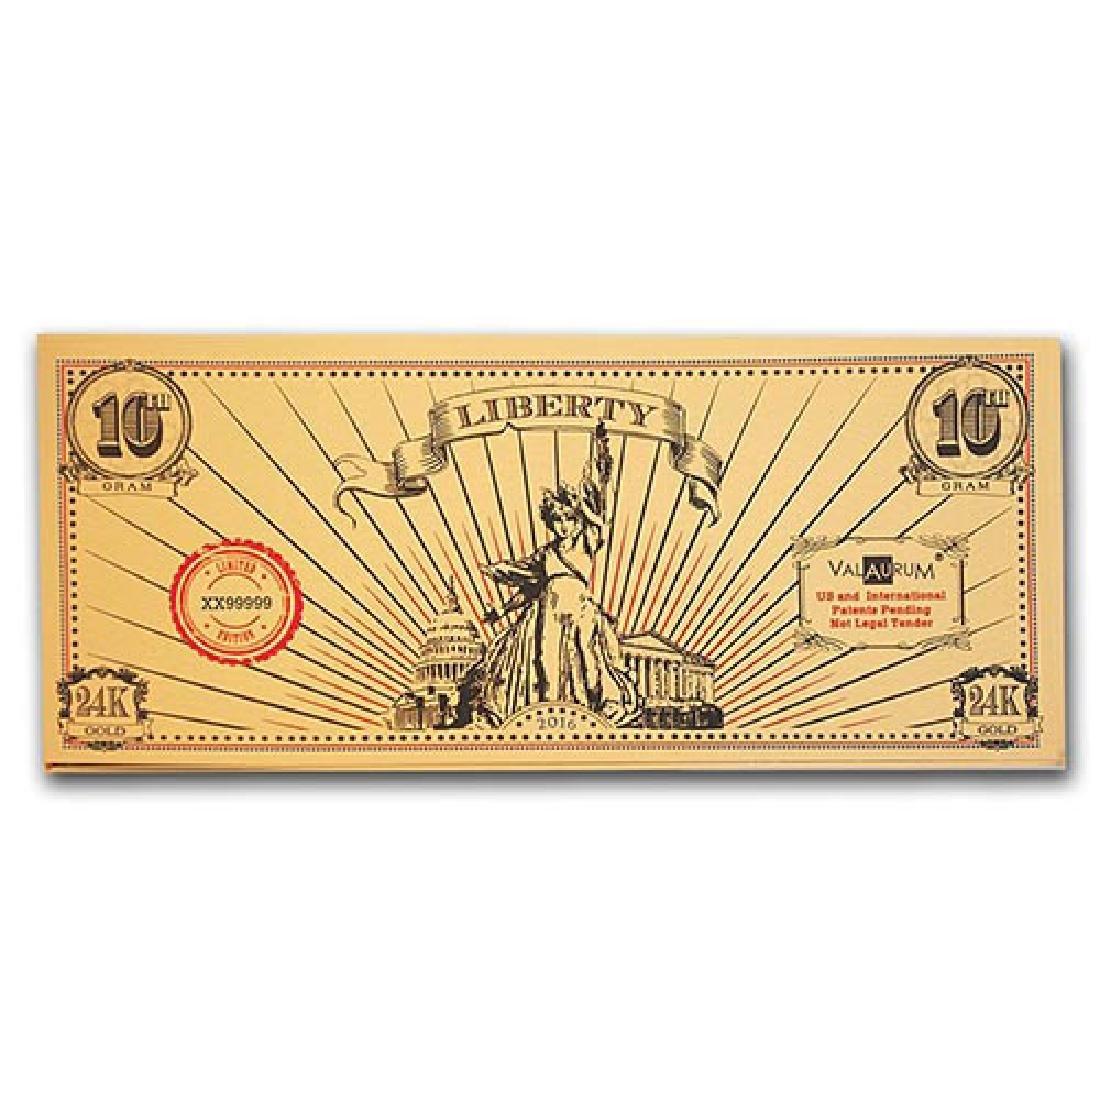 1/10 gram Gold Note - Valaurum (Lady Liberty Design, 24